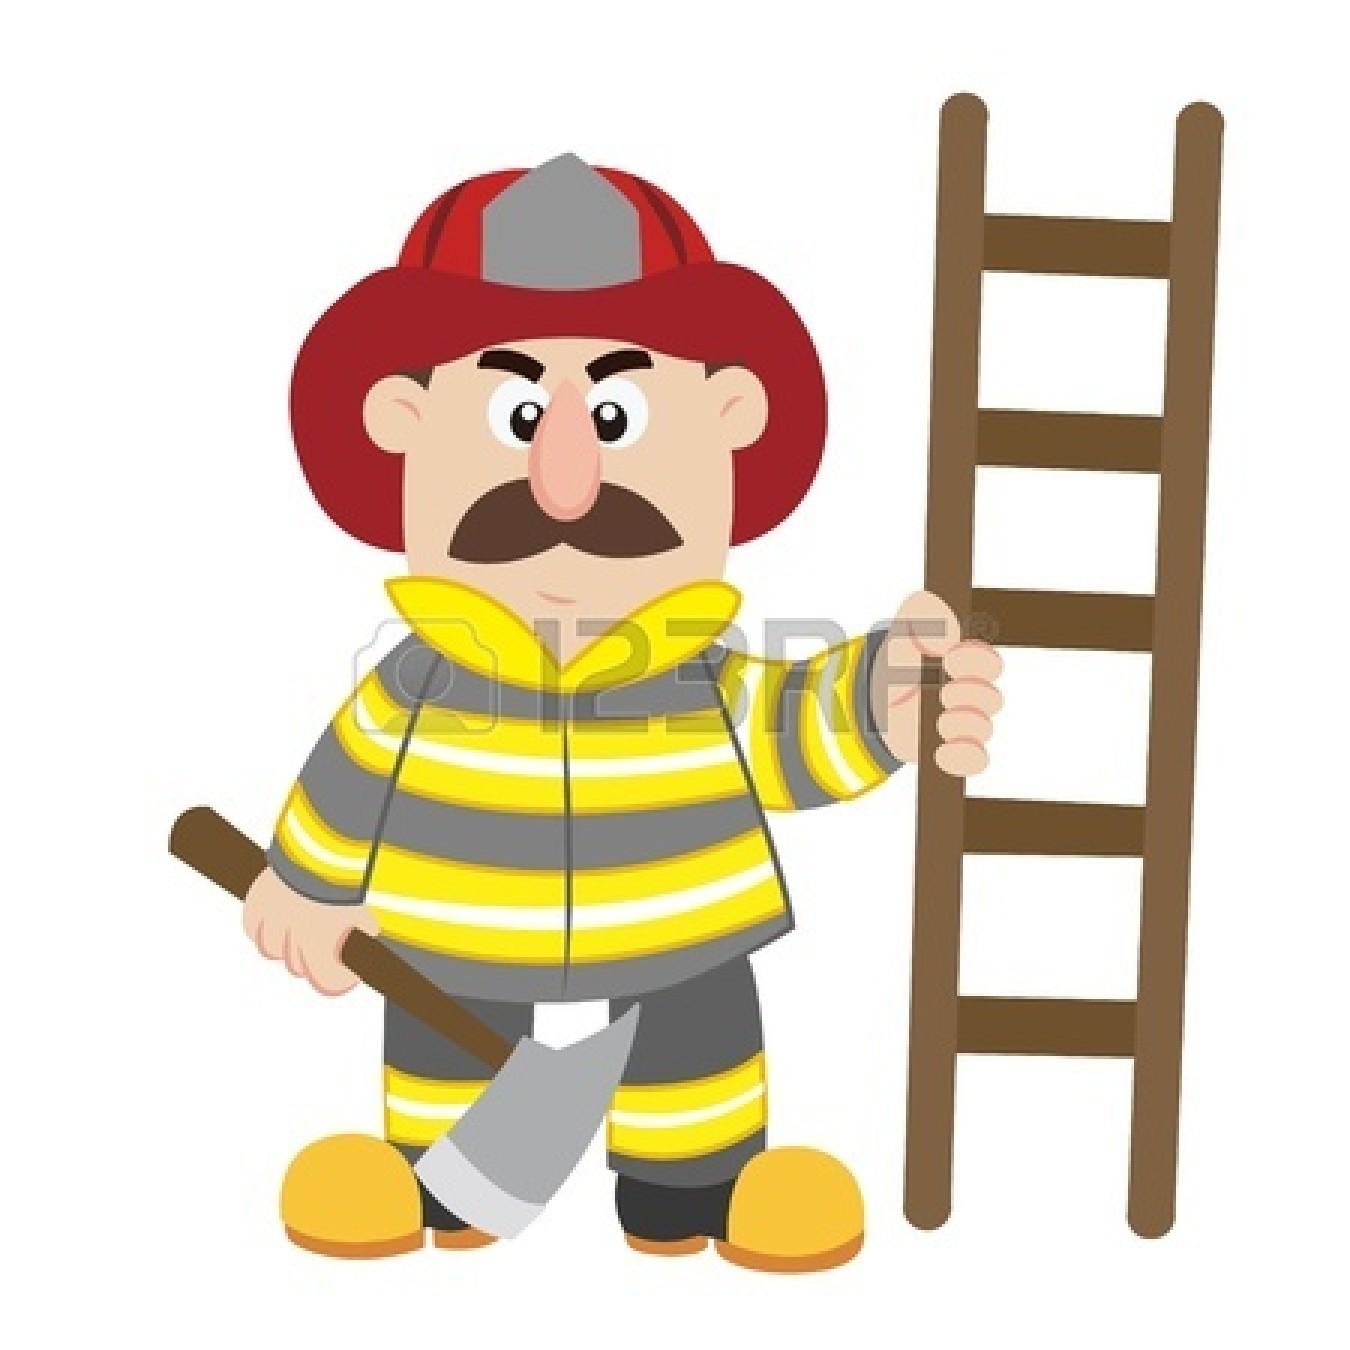 fireman sam clipart at getdrawings com free for personal use rh getdrawings com fireman's clip art fireman clipart free